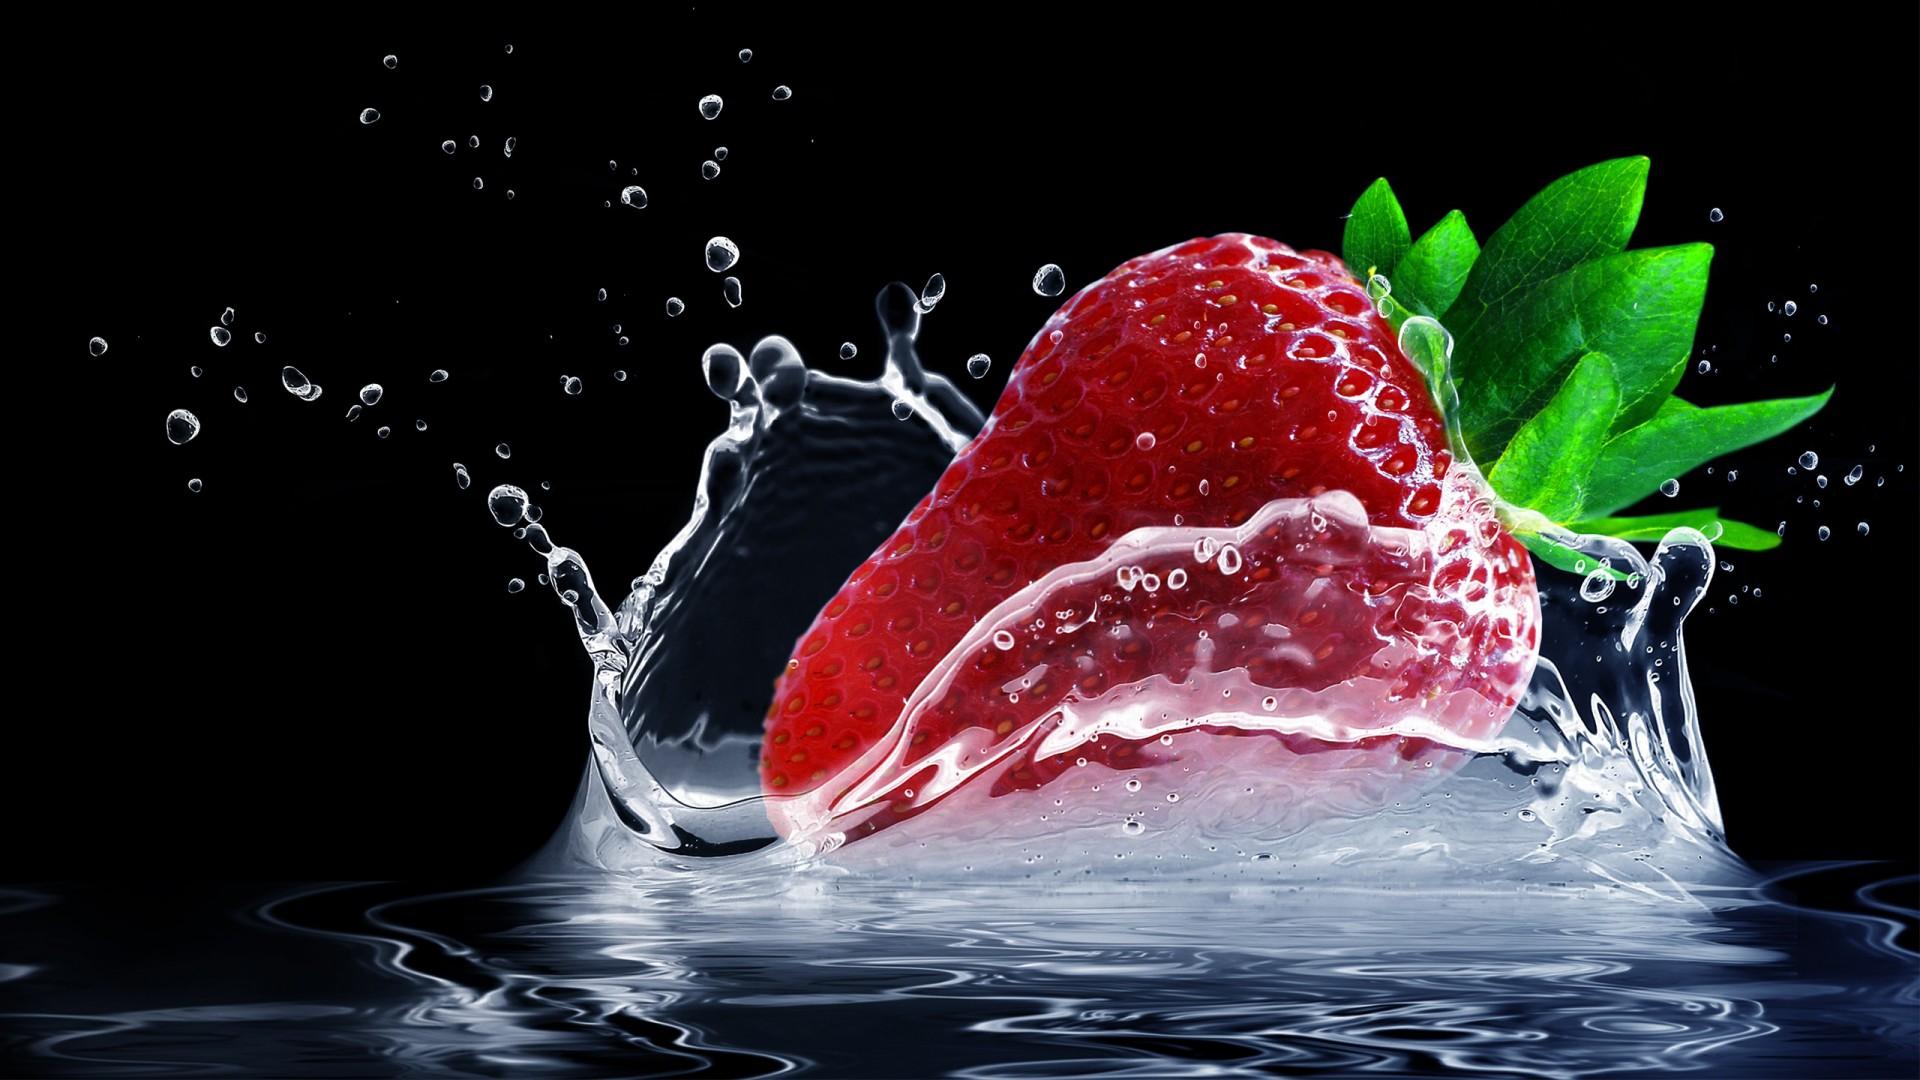 Wallpaper Strawberry Cute Strawberry Water Splash Wallpapers Hd Wallpapers Id 20779